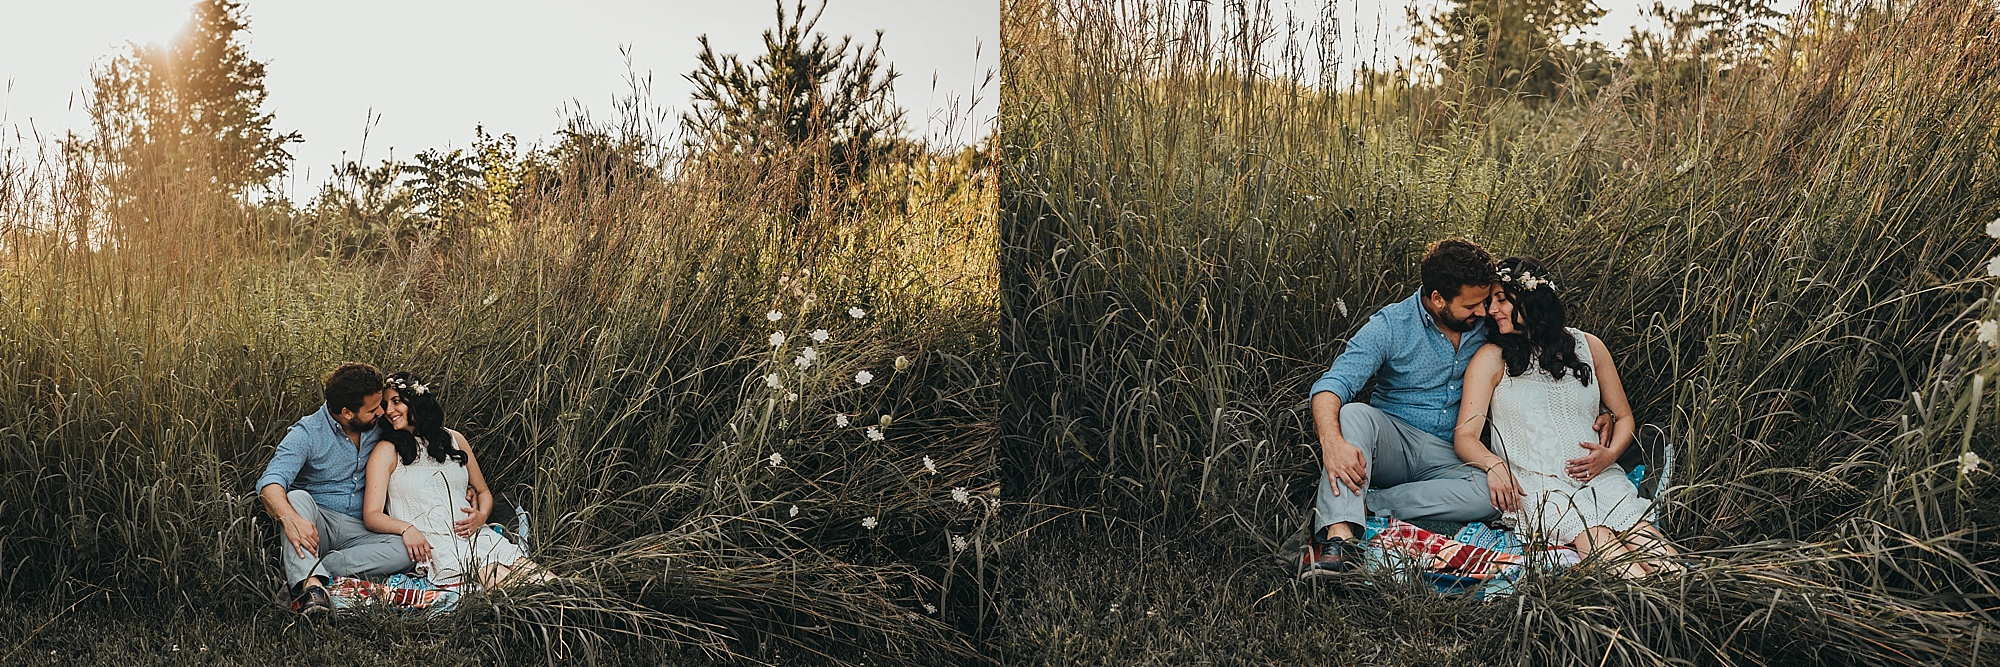 lauren-grayson-photography-cleveland-ohio-photographer-maternity-summer-outdoor-bohemian-fields-session_0470.jpg